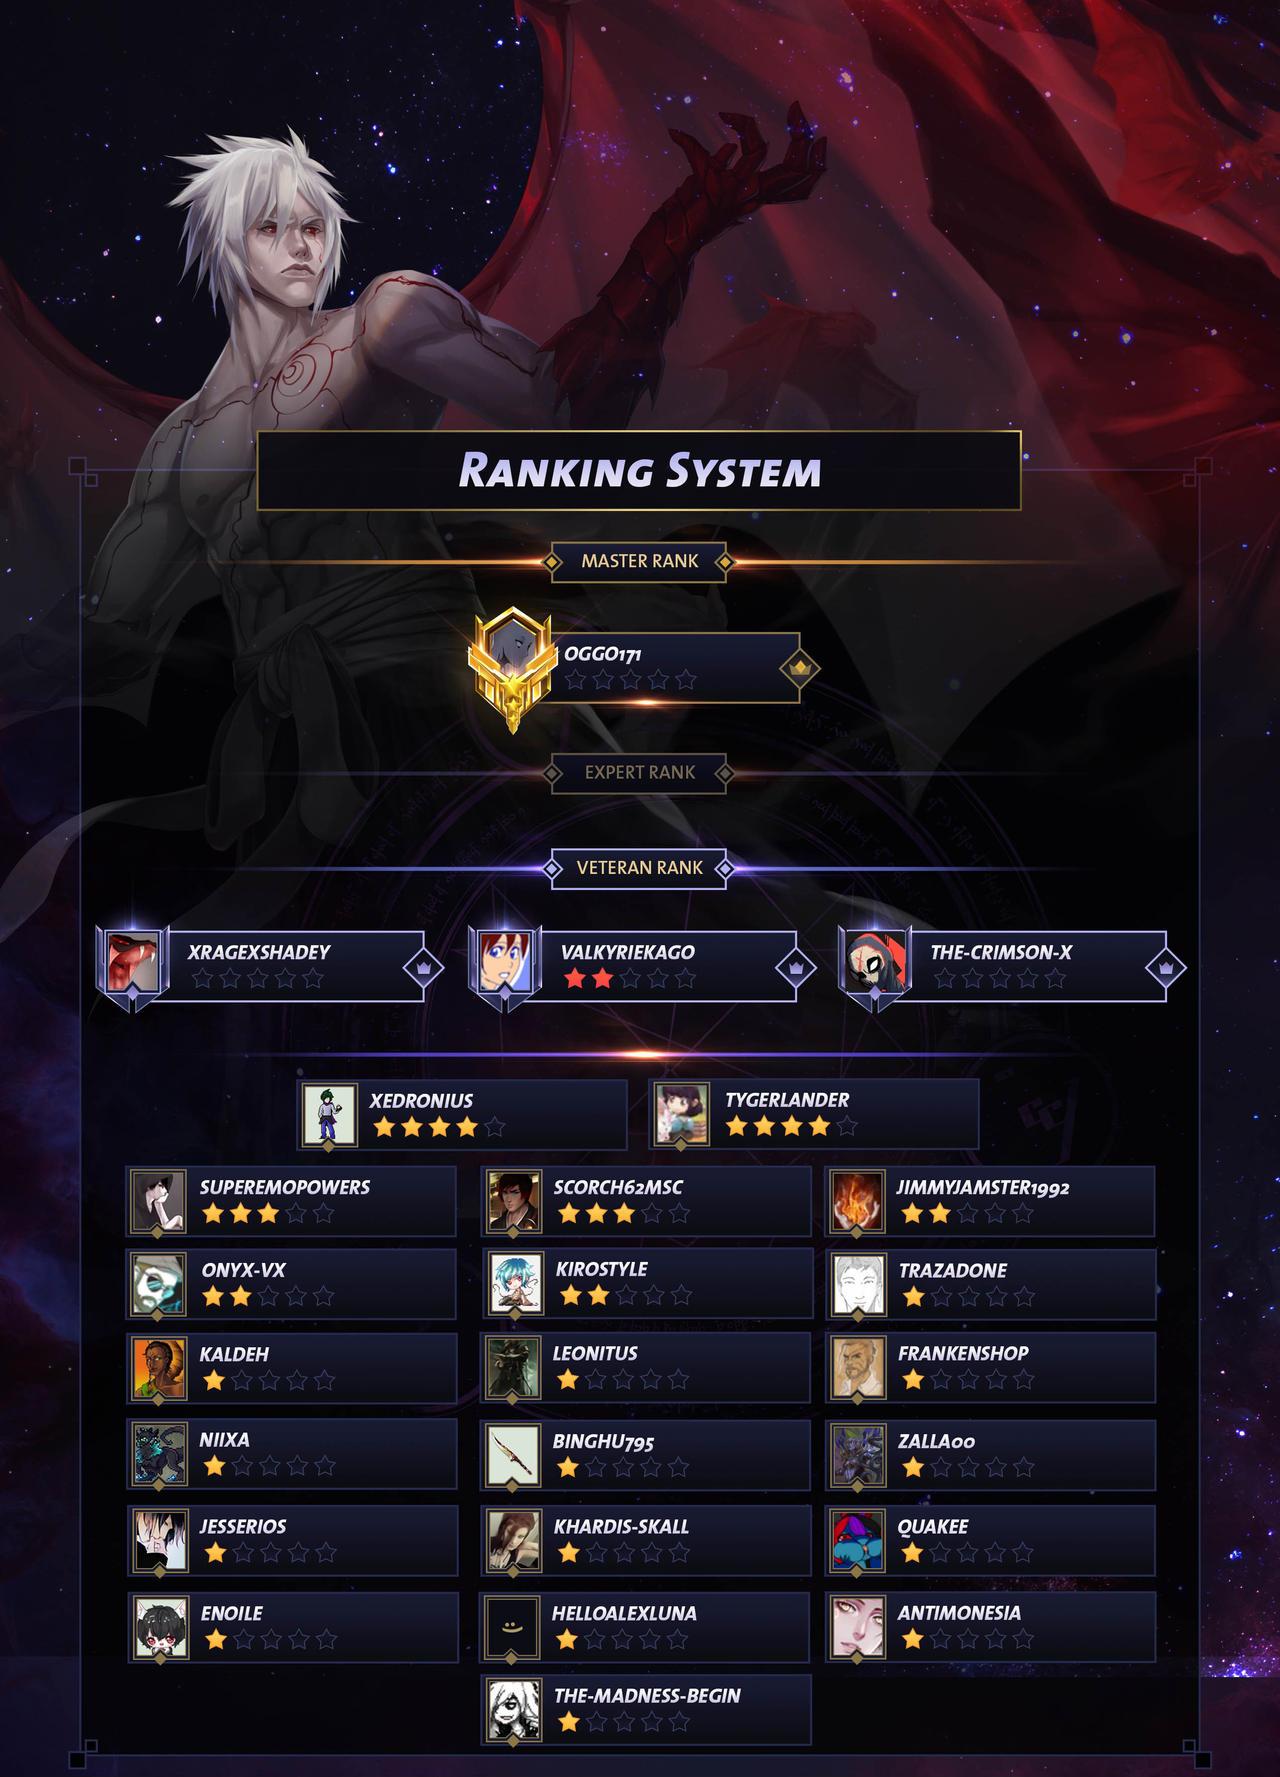 2020-Ranking System-14